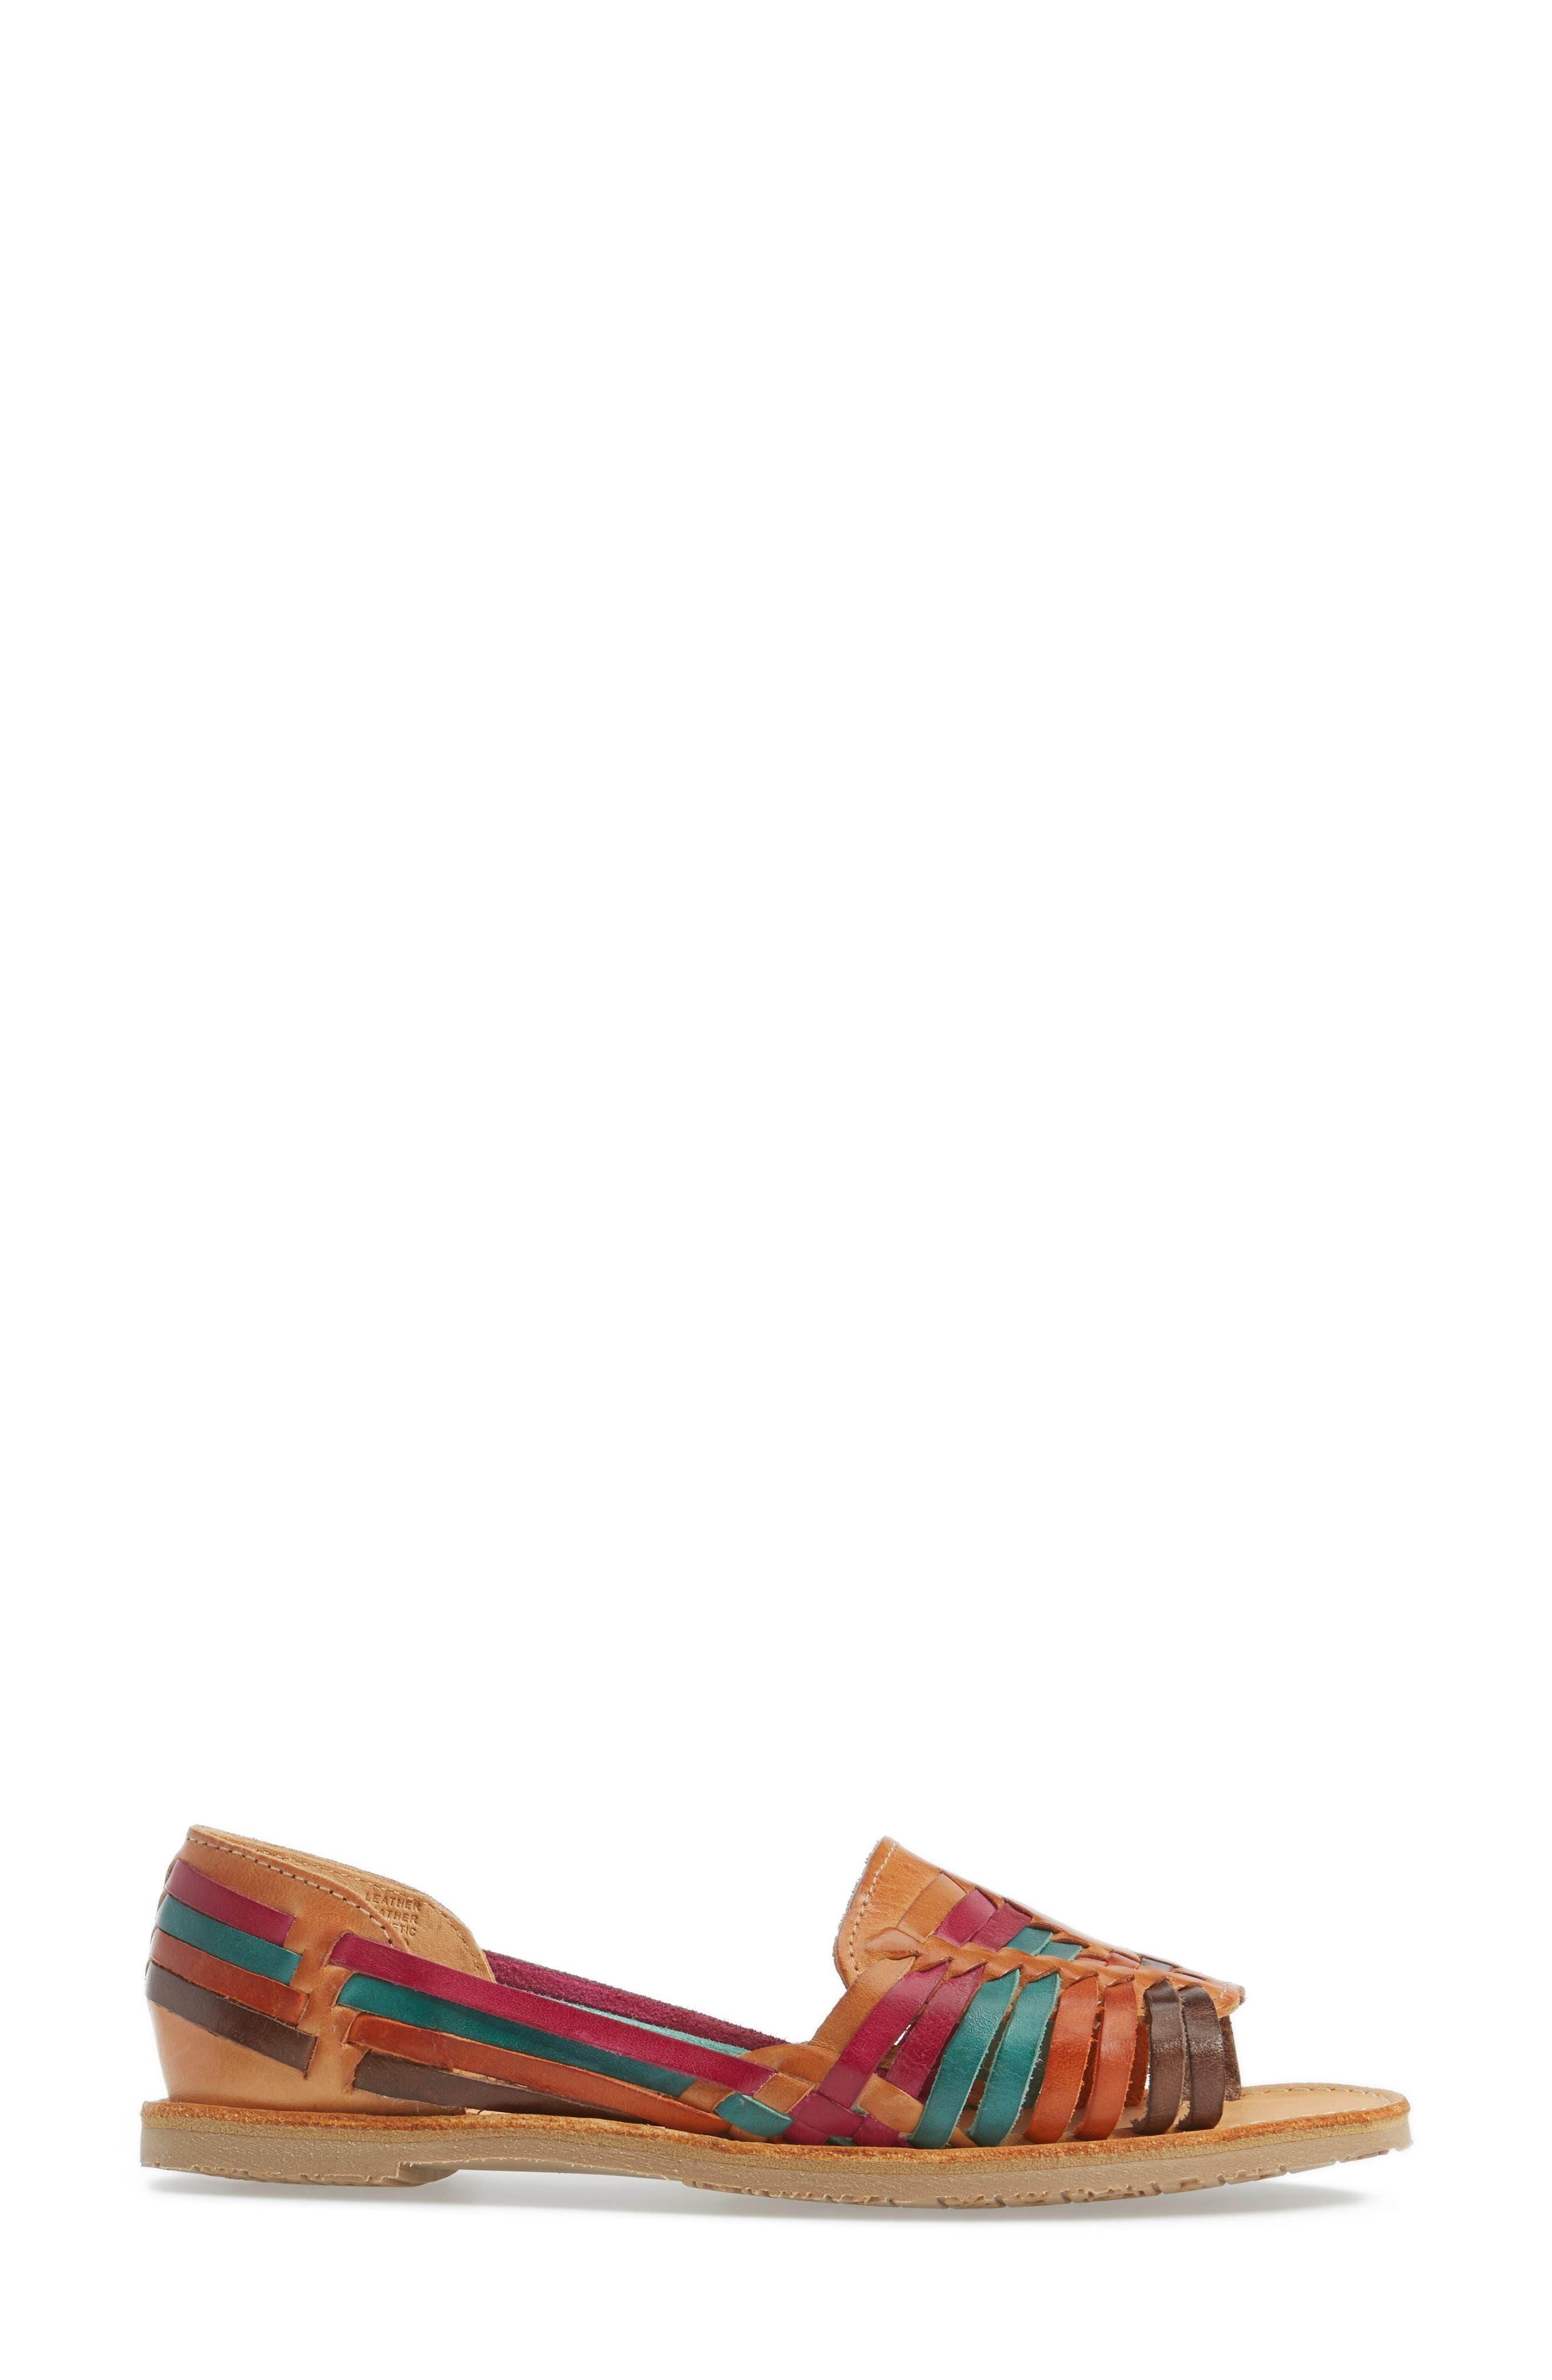 Alternate Image 3  - Sbicca Jared Peep Toe Flat (Women)